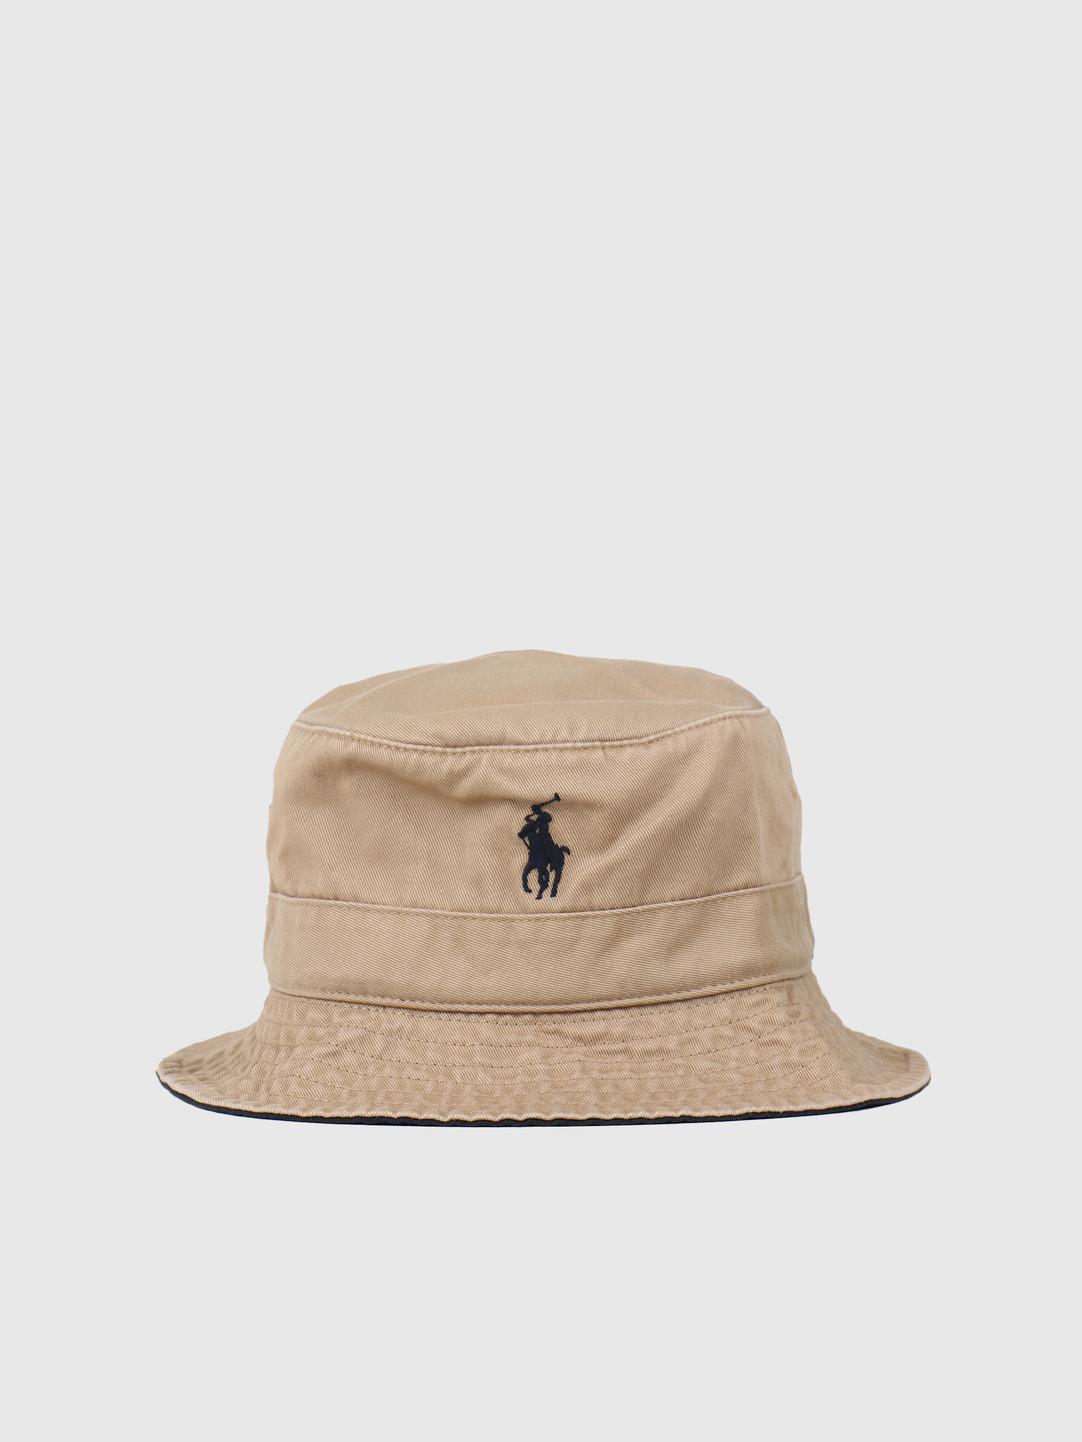 Polo Ralph Lauren Polo Ralph Lauren Loft Bucket Hat Boating Khaki 710798567002